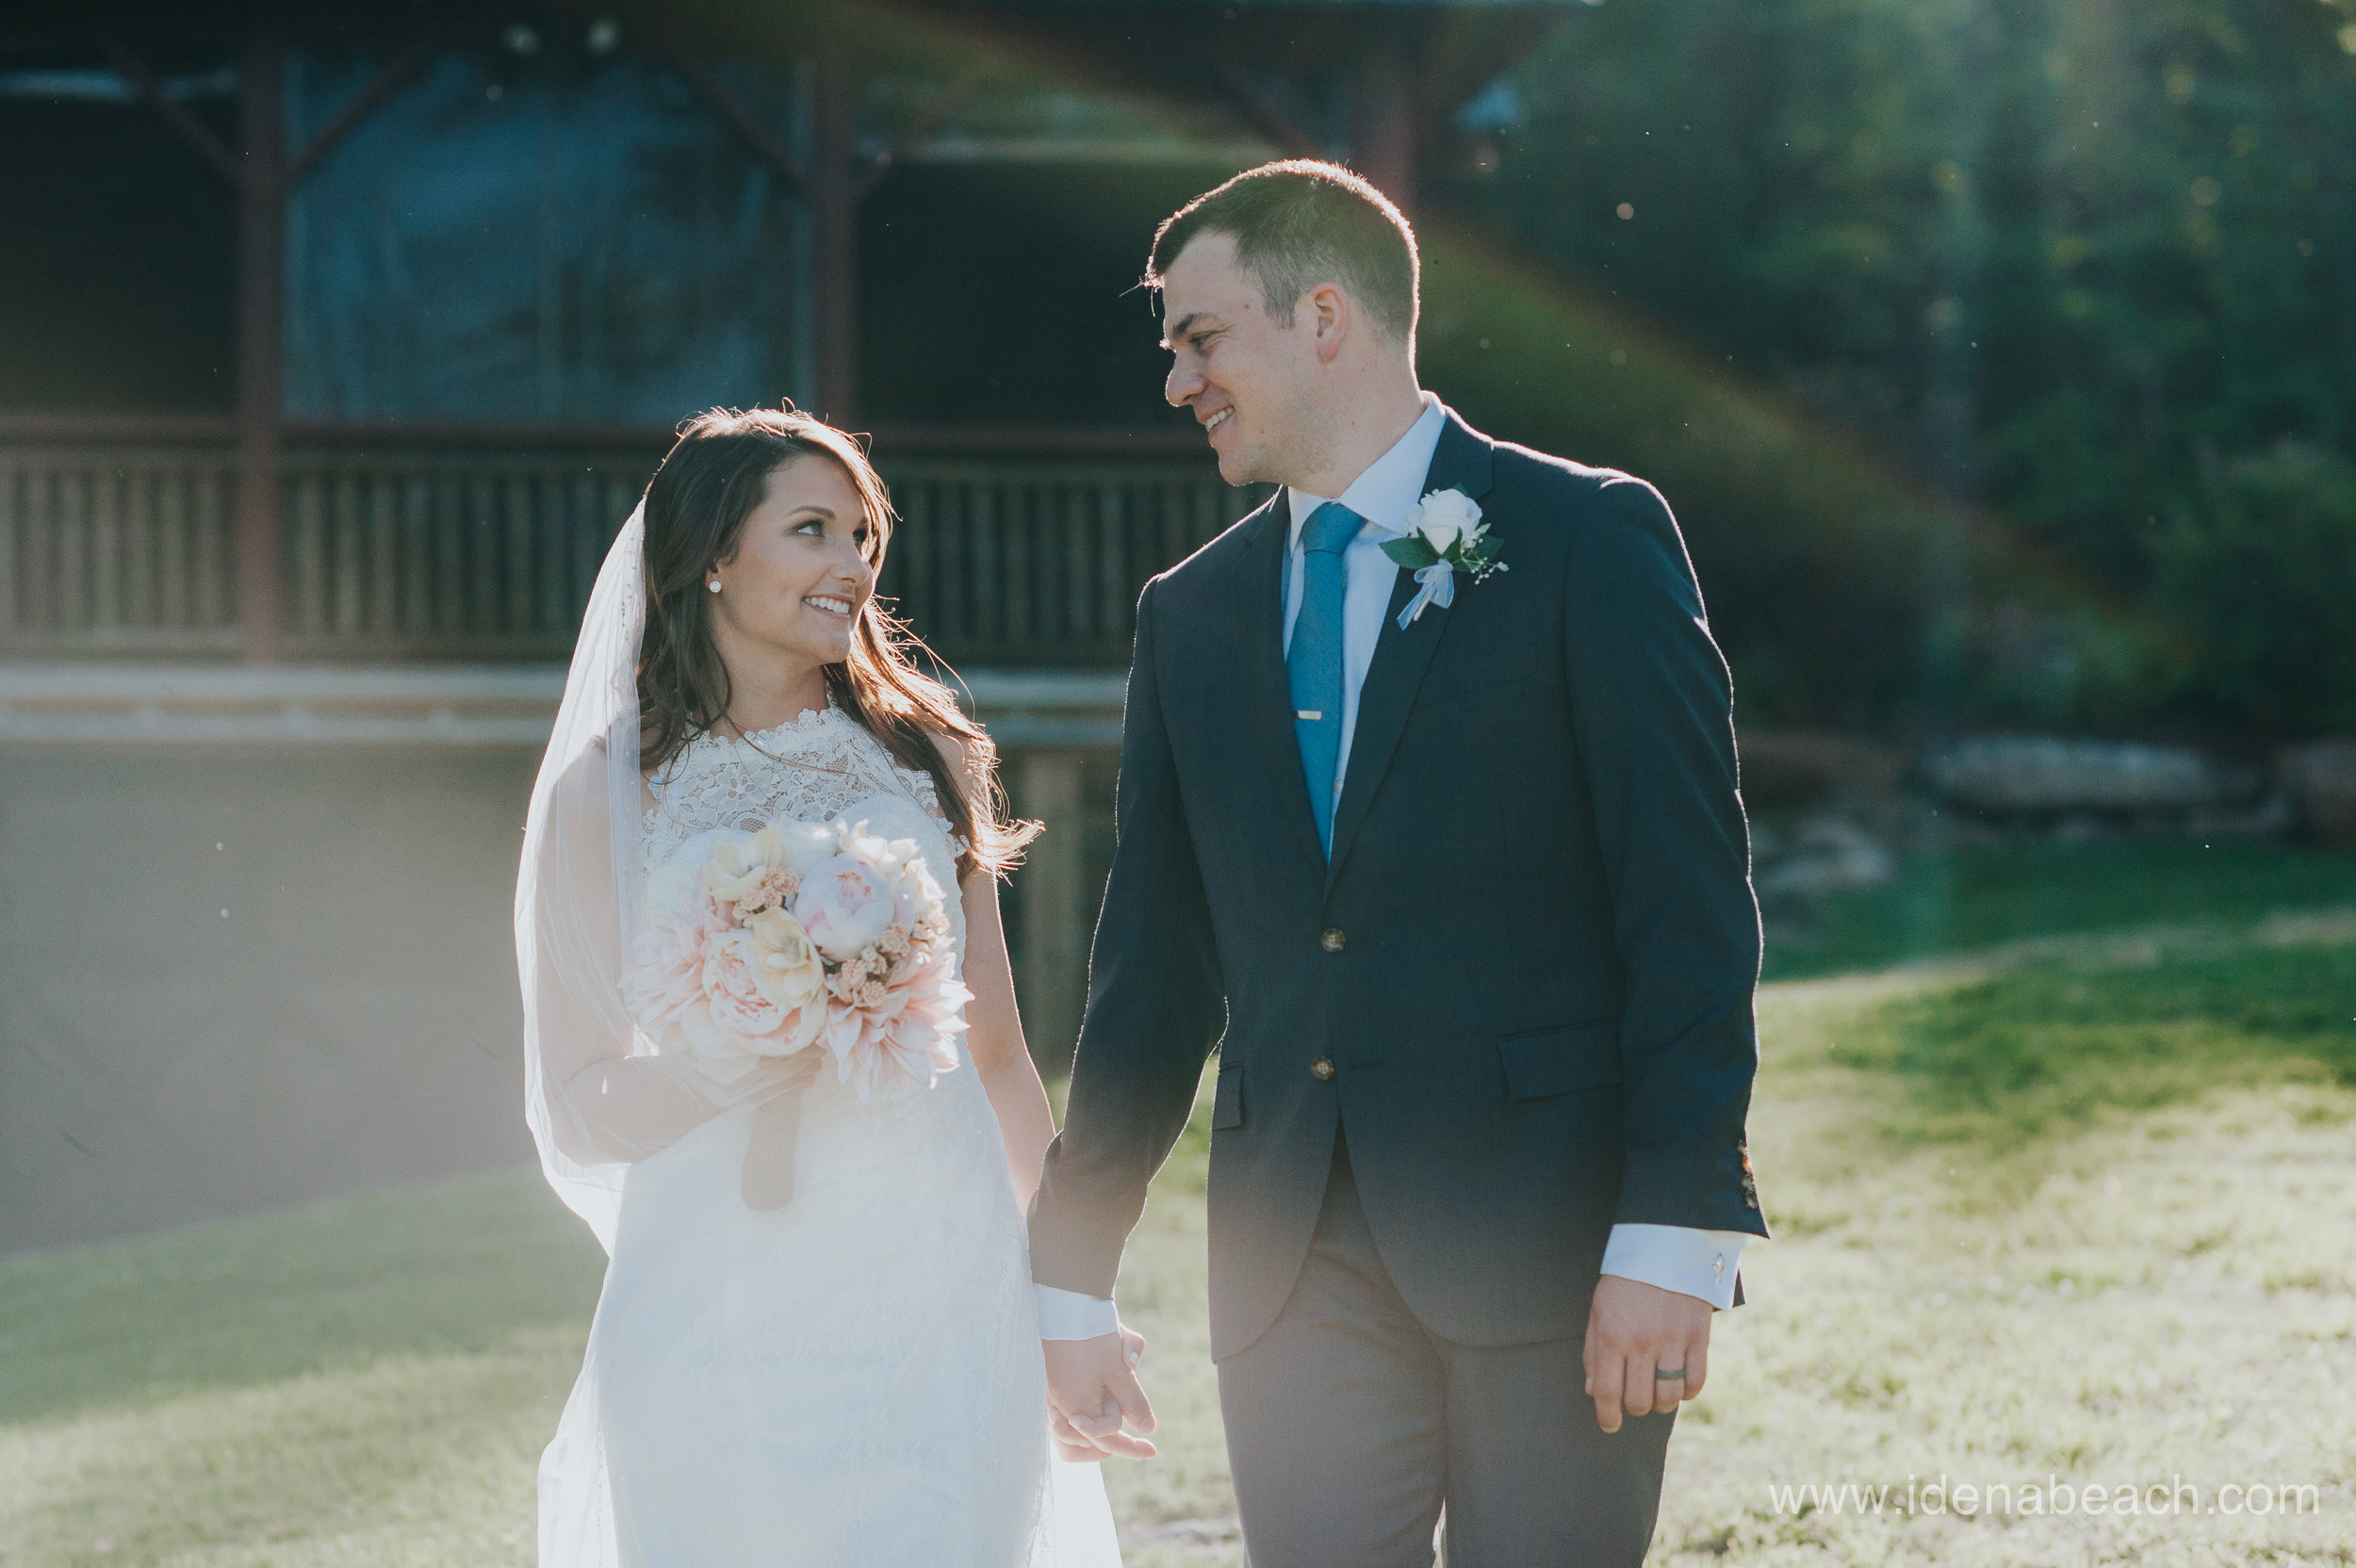 Mountain-Top-Inn-Vermont-Wedding-Photographer-109.jpg